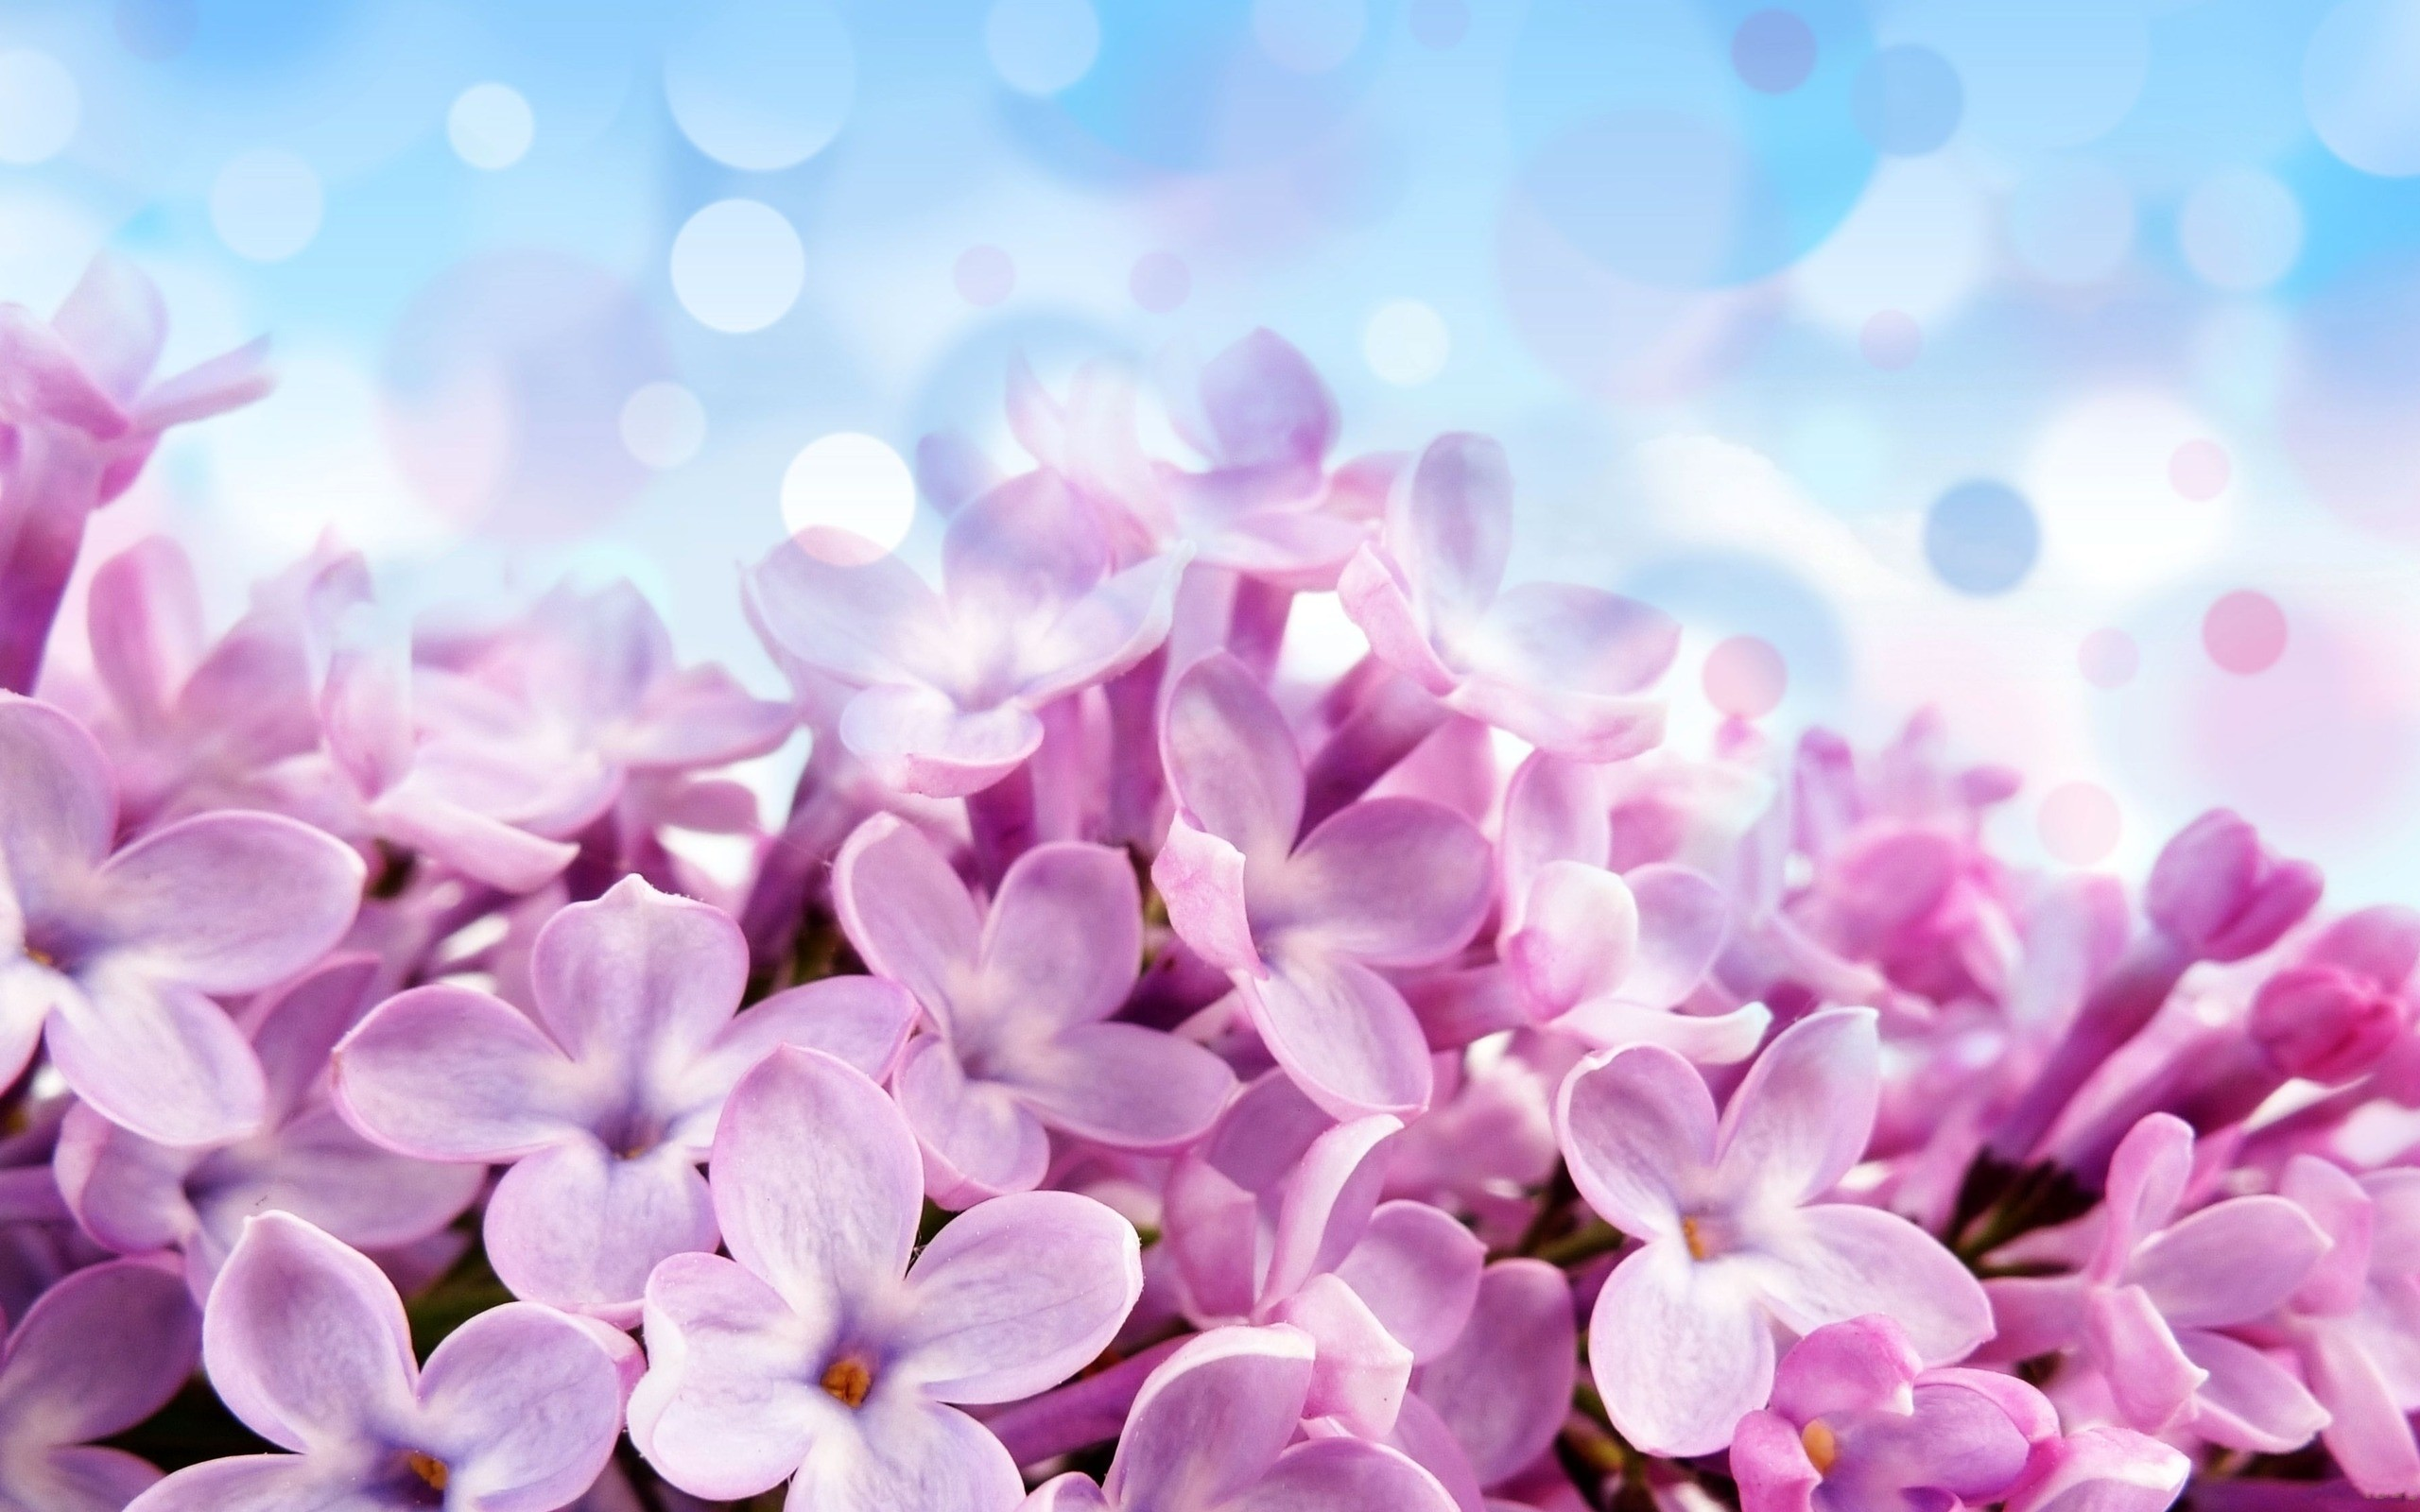 Fondos Flores ADNFriki (6)